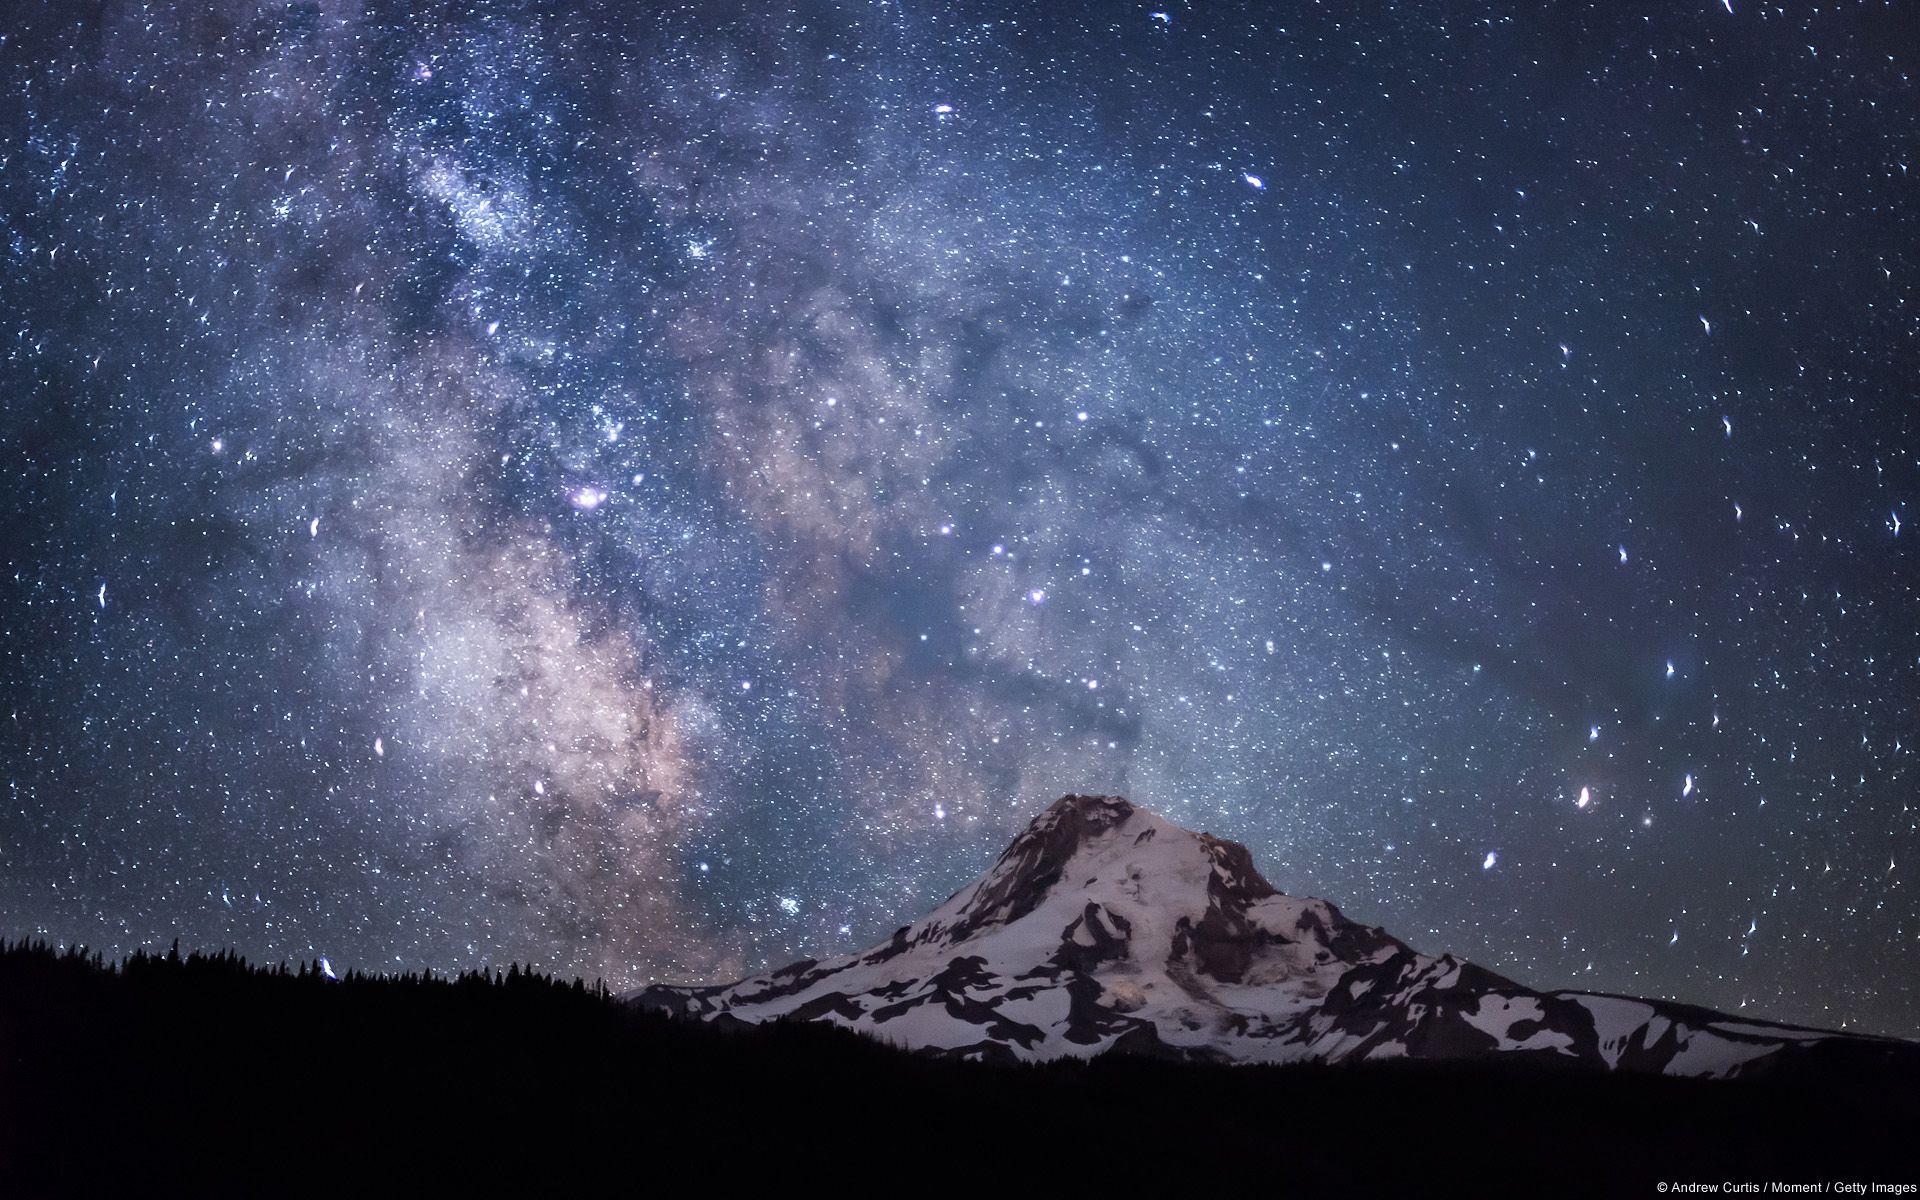 Wallpapers Milky Way Starry Night Images Desktop Background Pictures